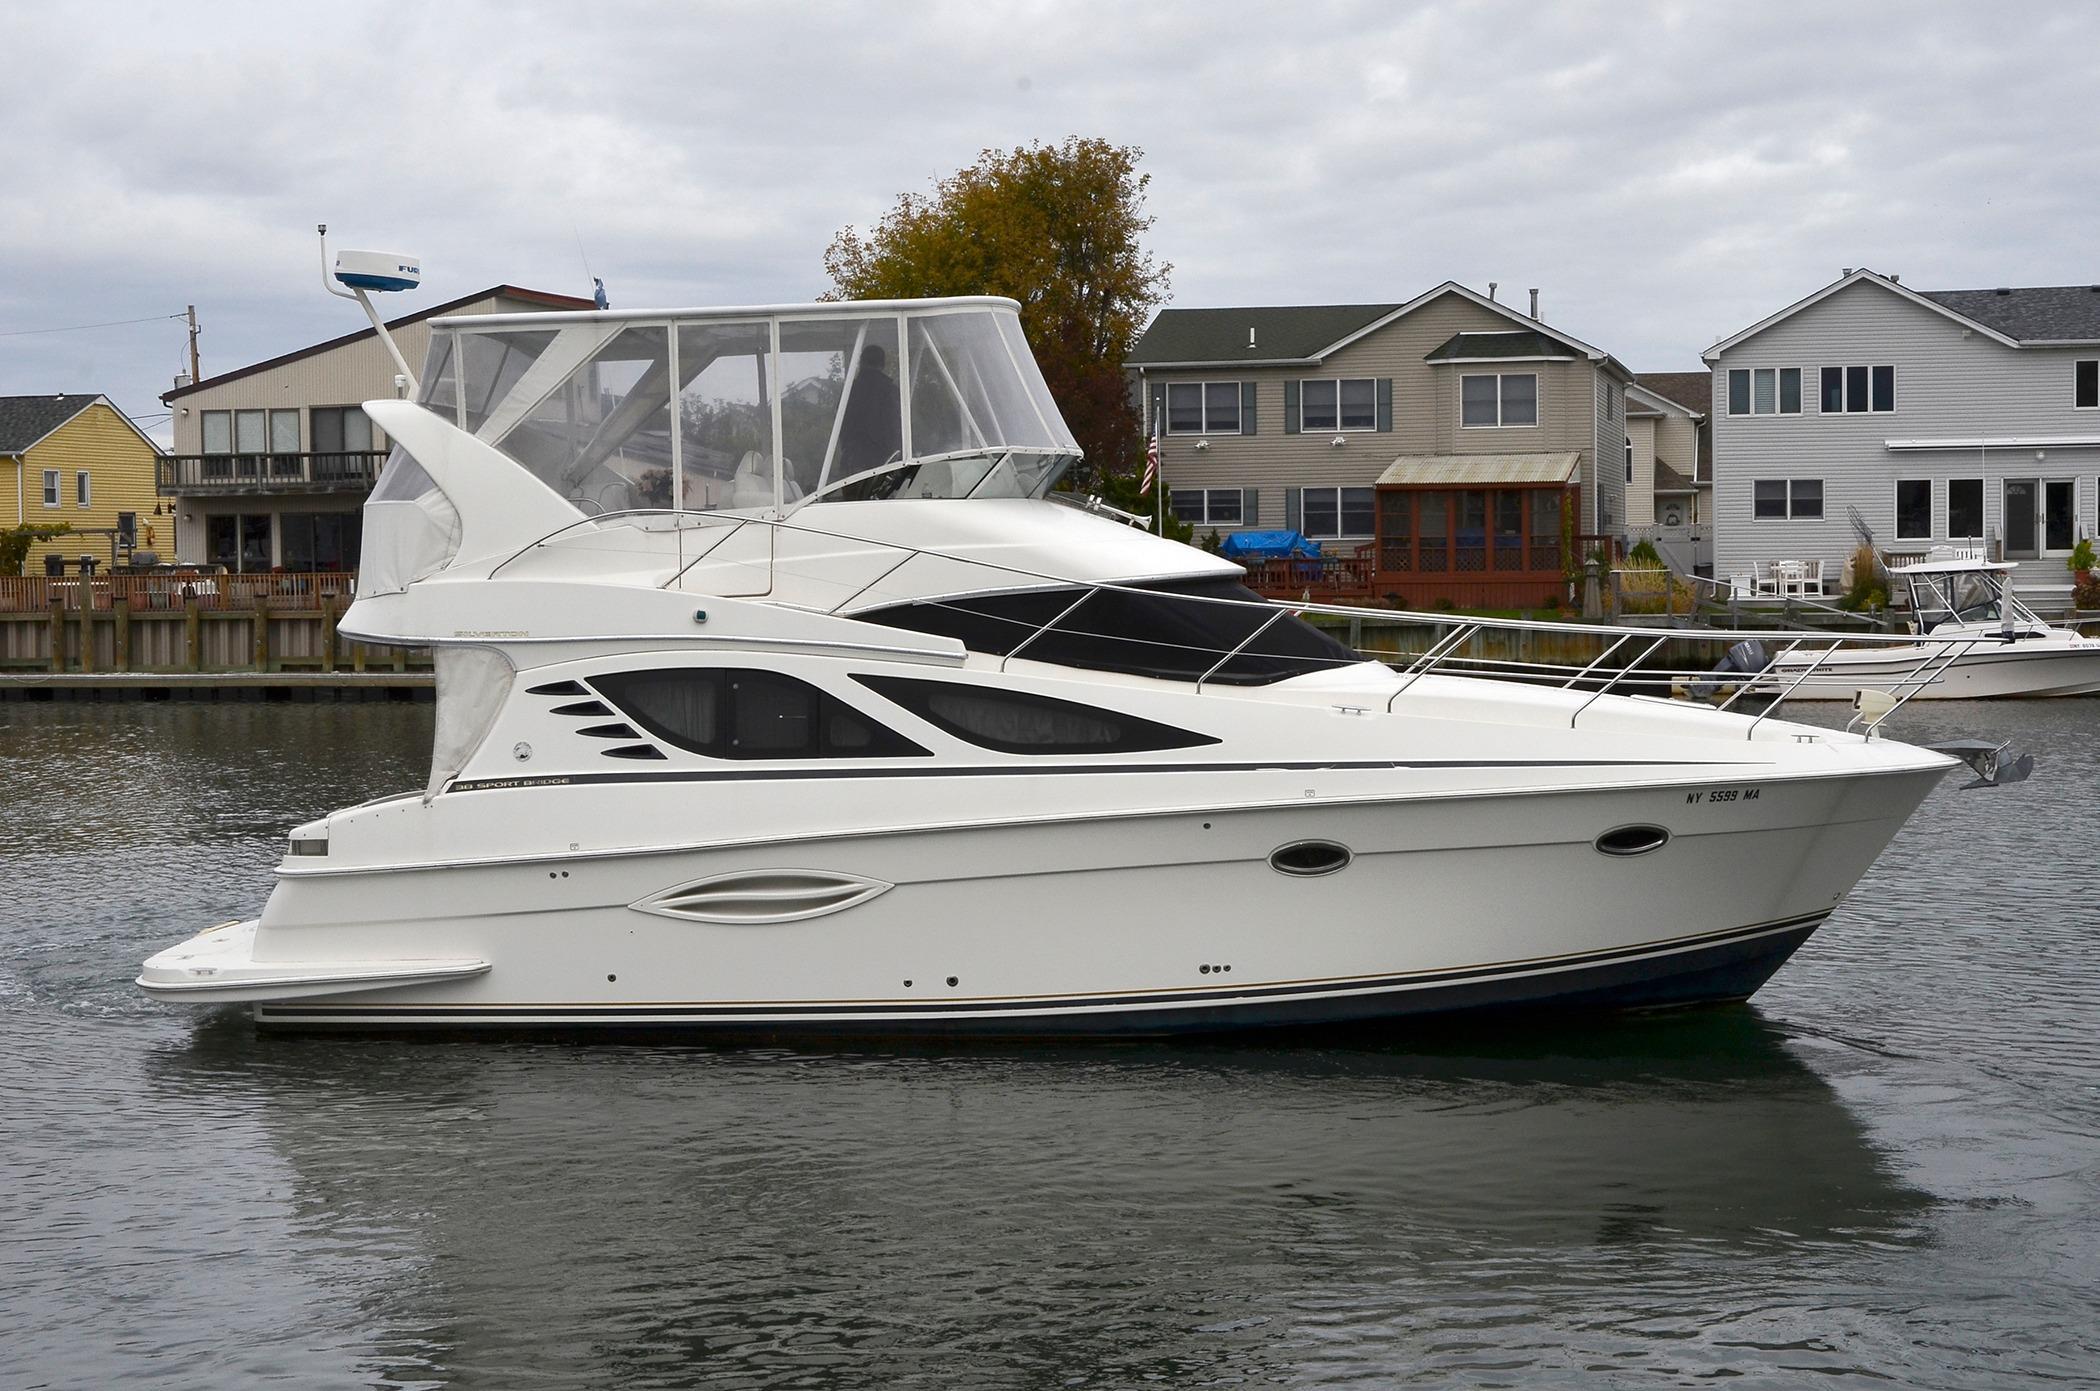 38 silverton yachts 2005  u0026quot rosie u0026 39 s shadow u0026quot  for sale in freeport yacht club  new york  us